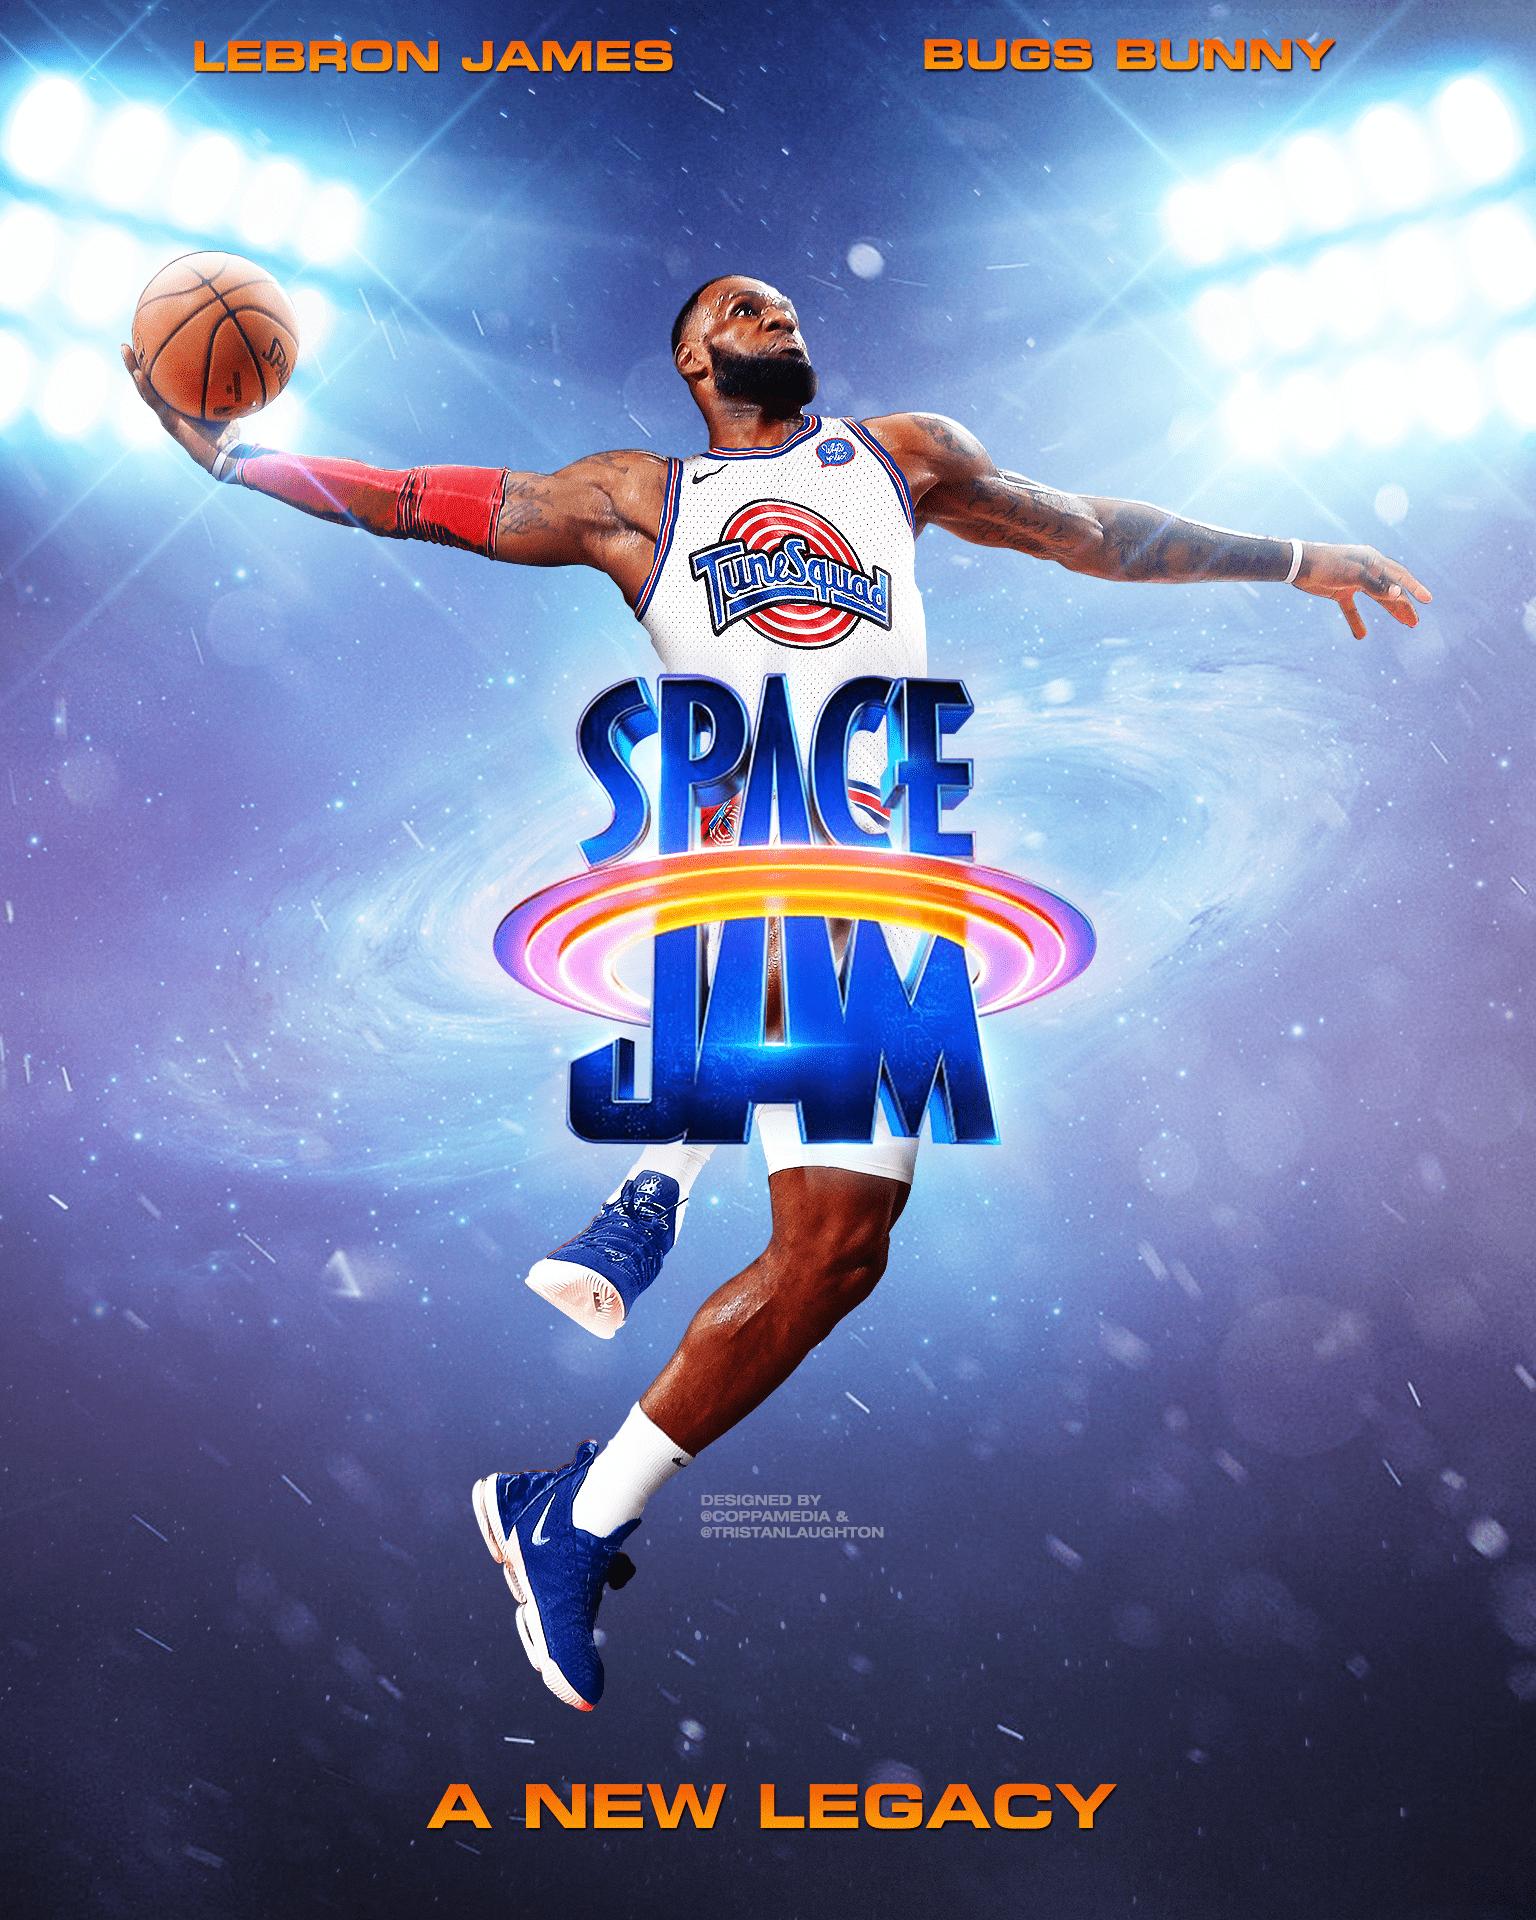 Space Jam Poster Design Space Jam Lebron James Lebron James Poster